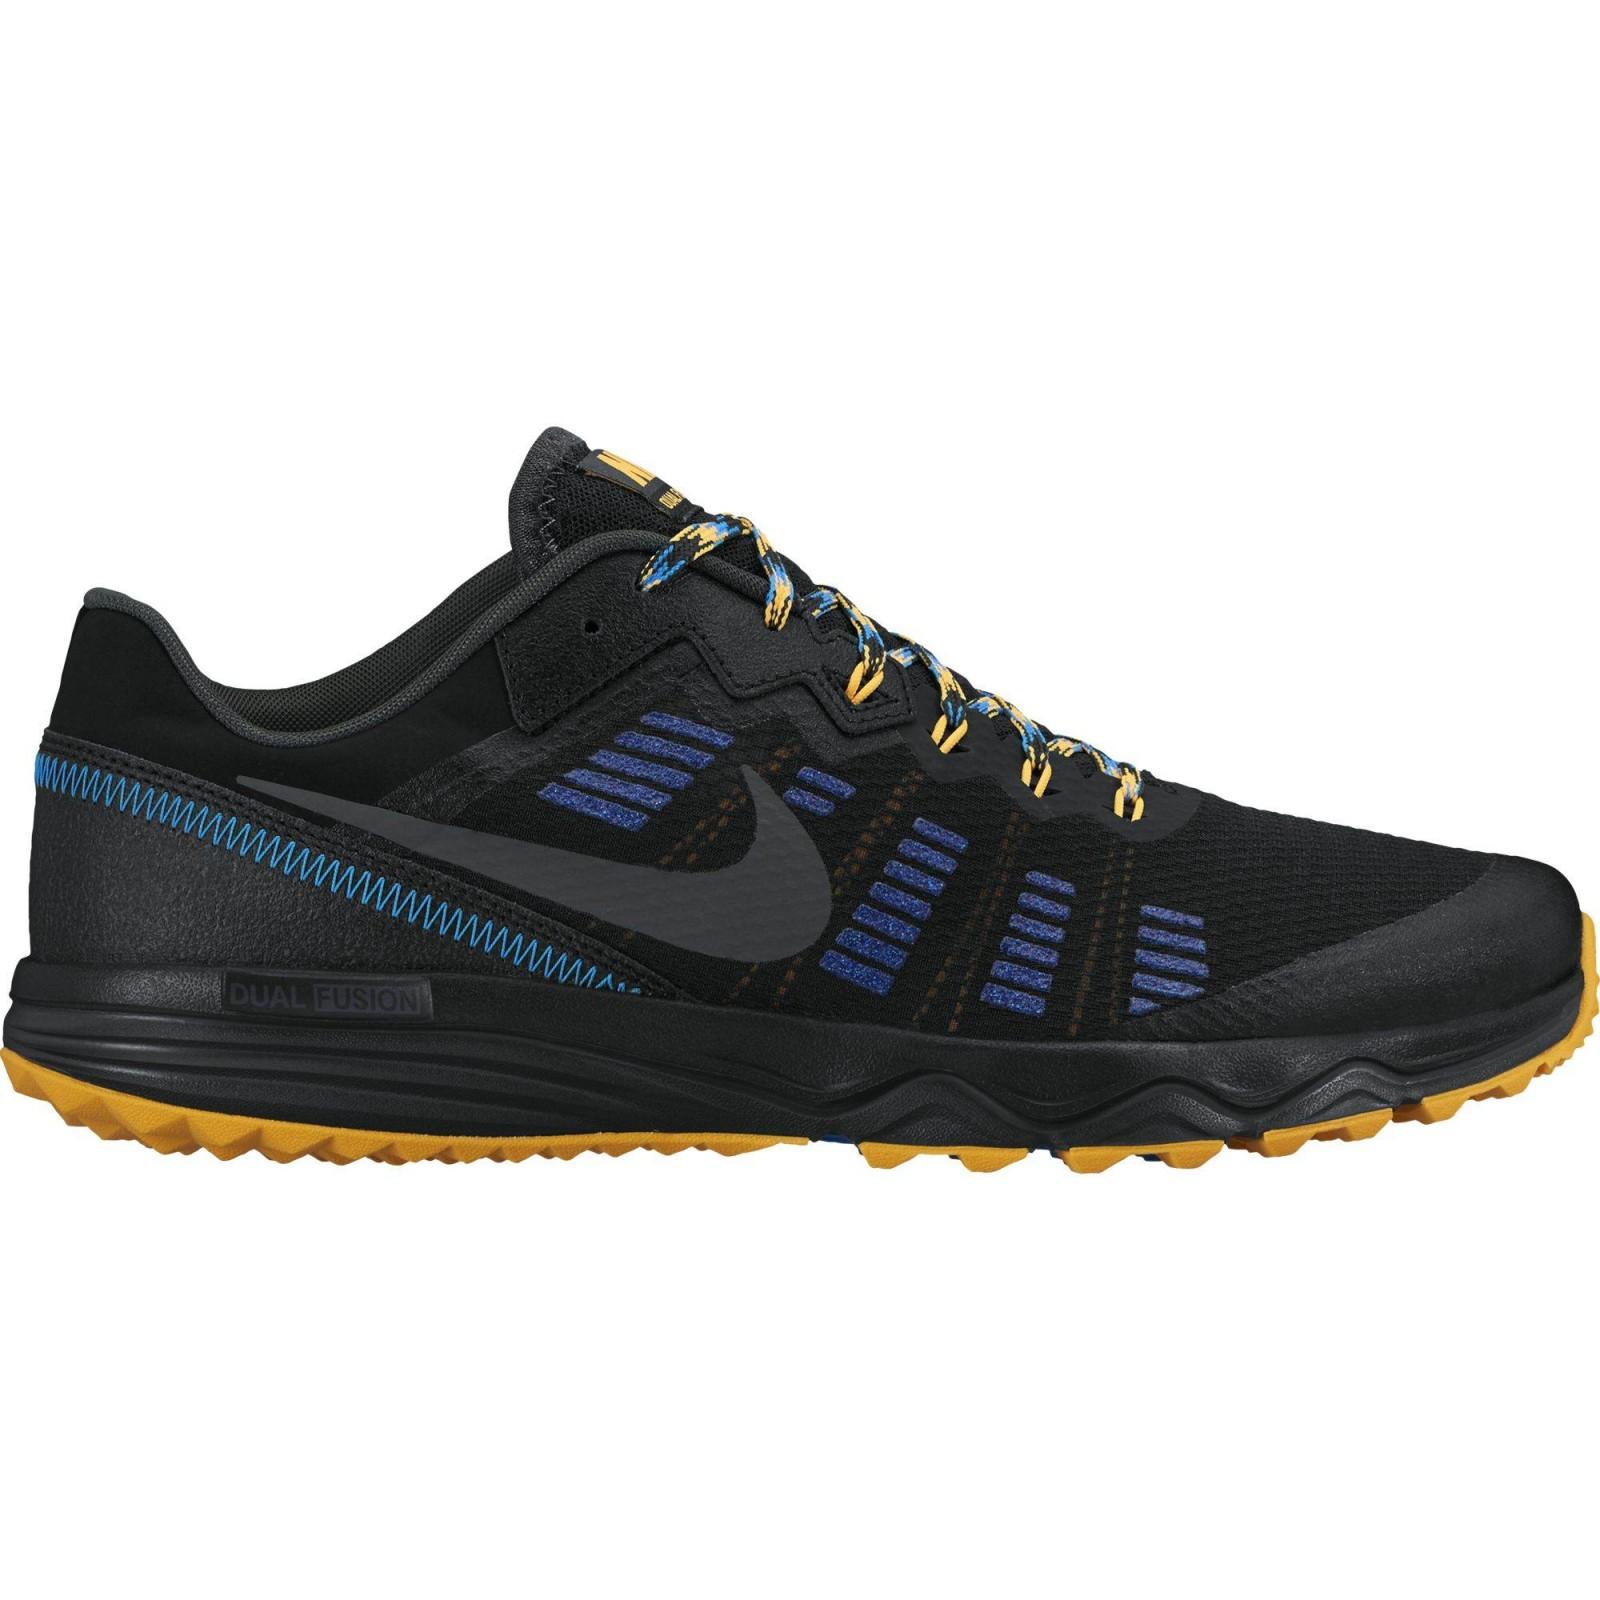 Pánské běžecké boty Nike DUAL FUSION TRAIL 2  13938eb825a